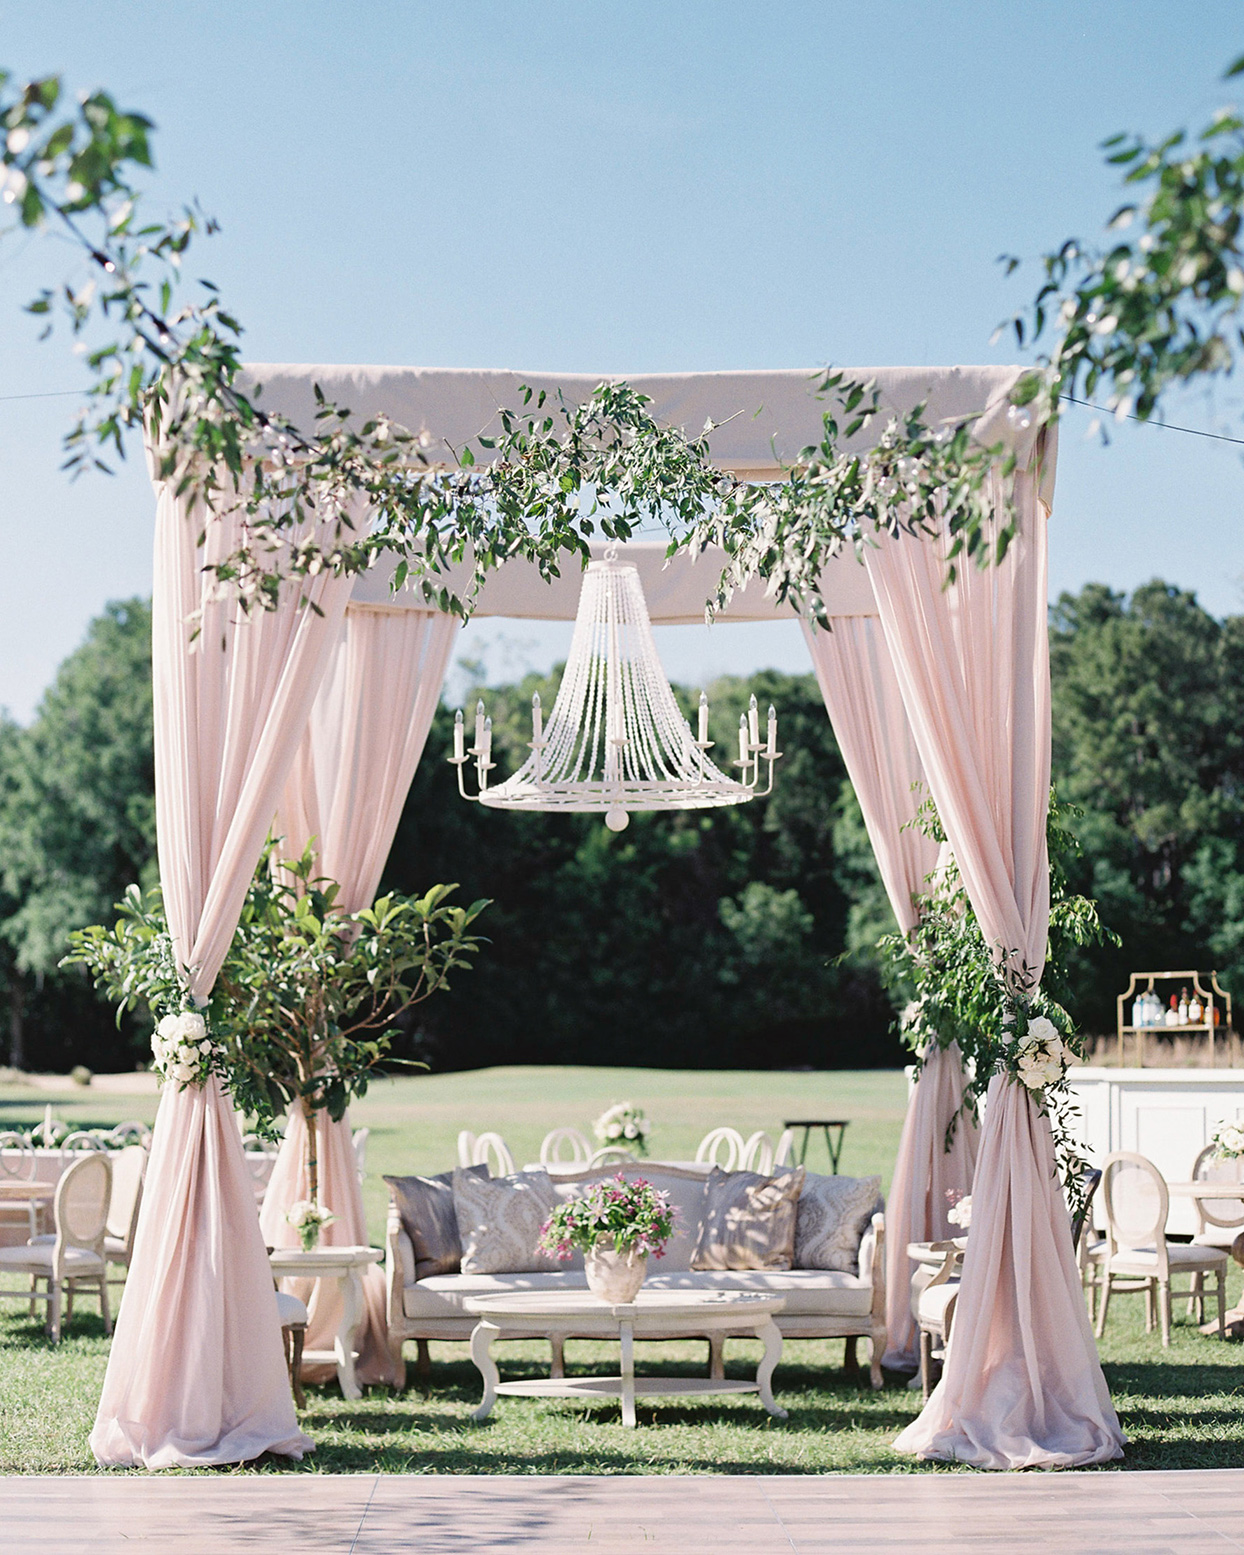 chelsea john wedding lounge with pastel tent